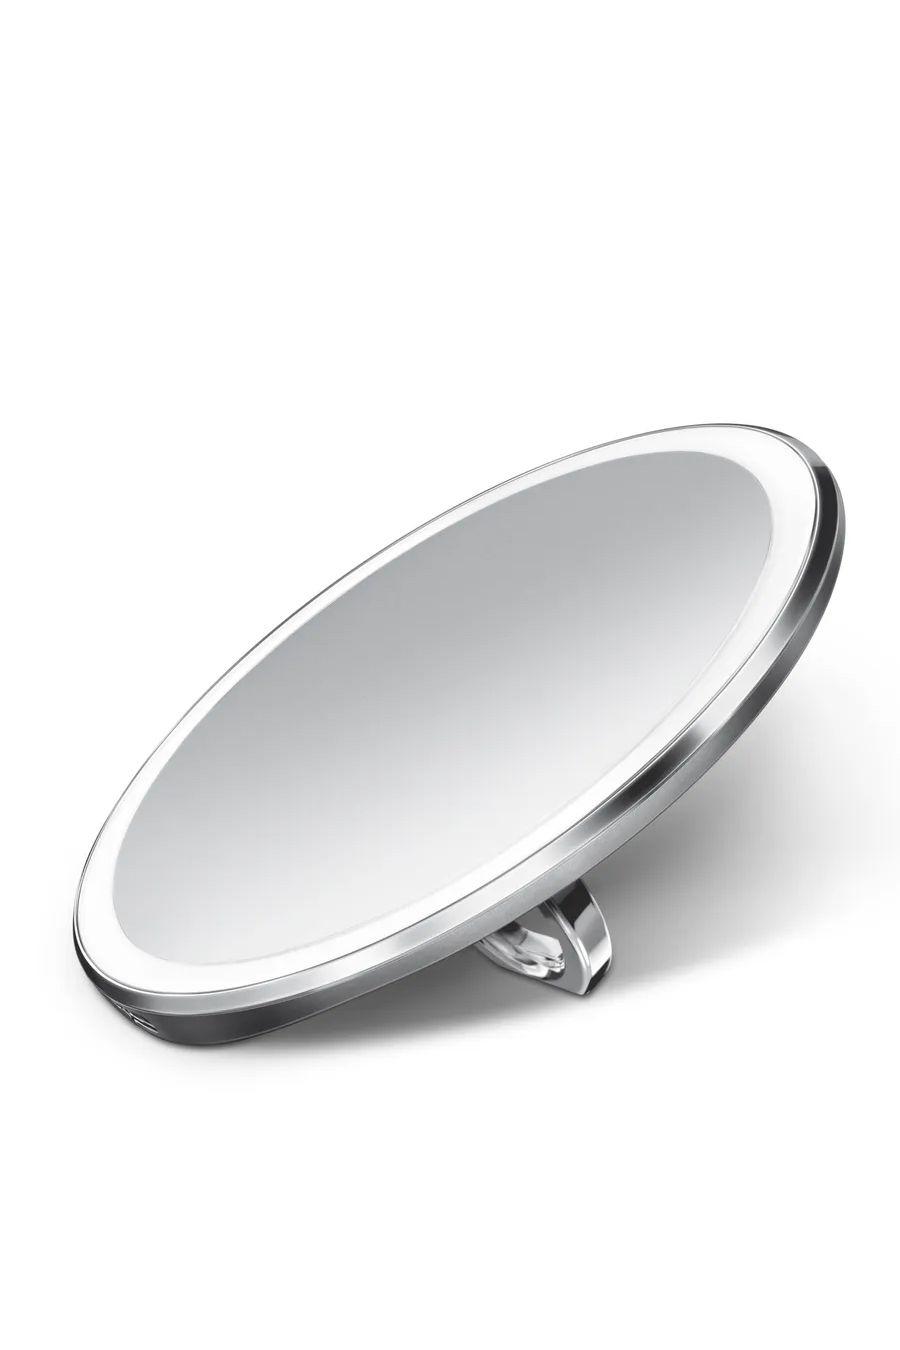 Compact vanity sensor mirror